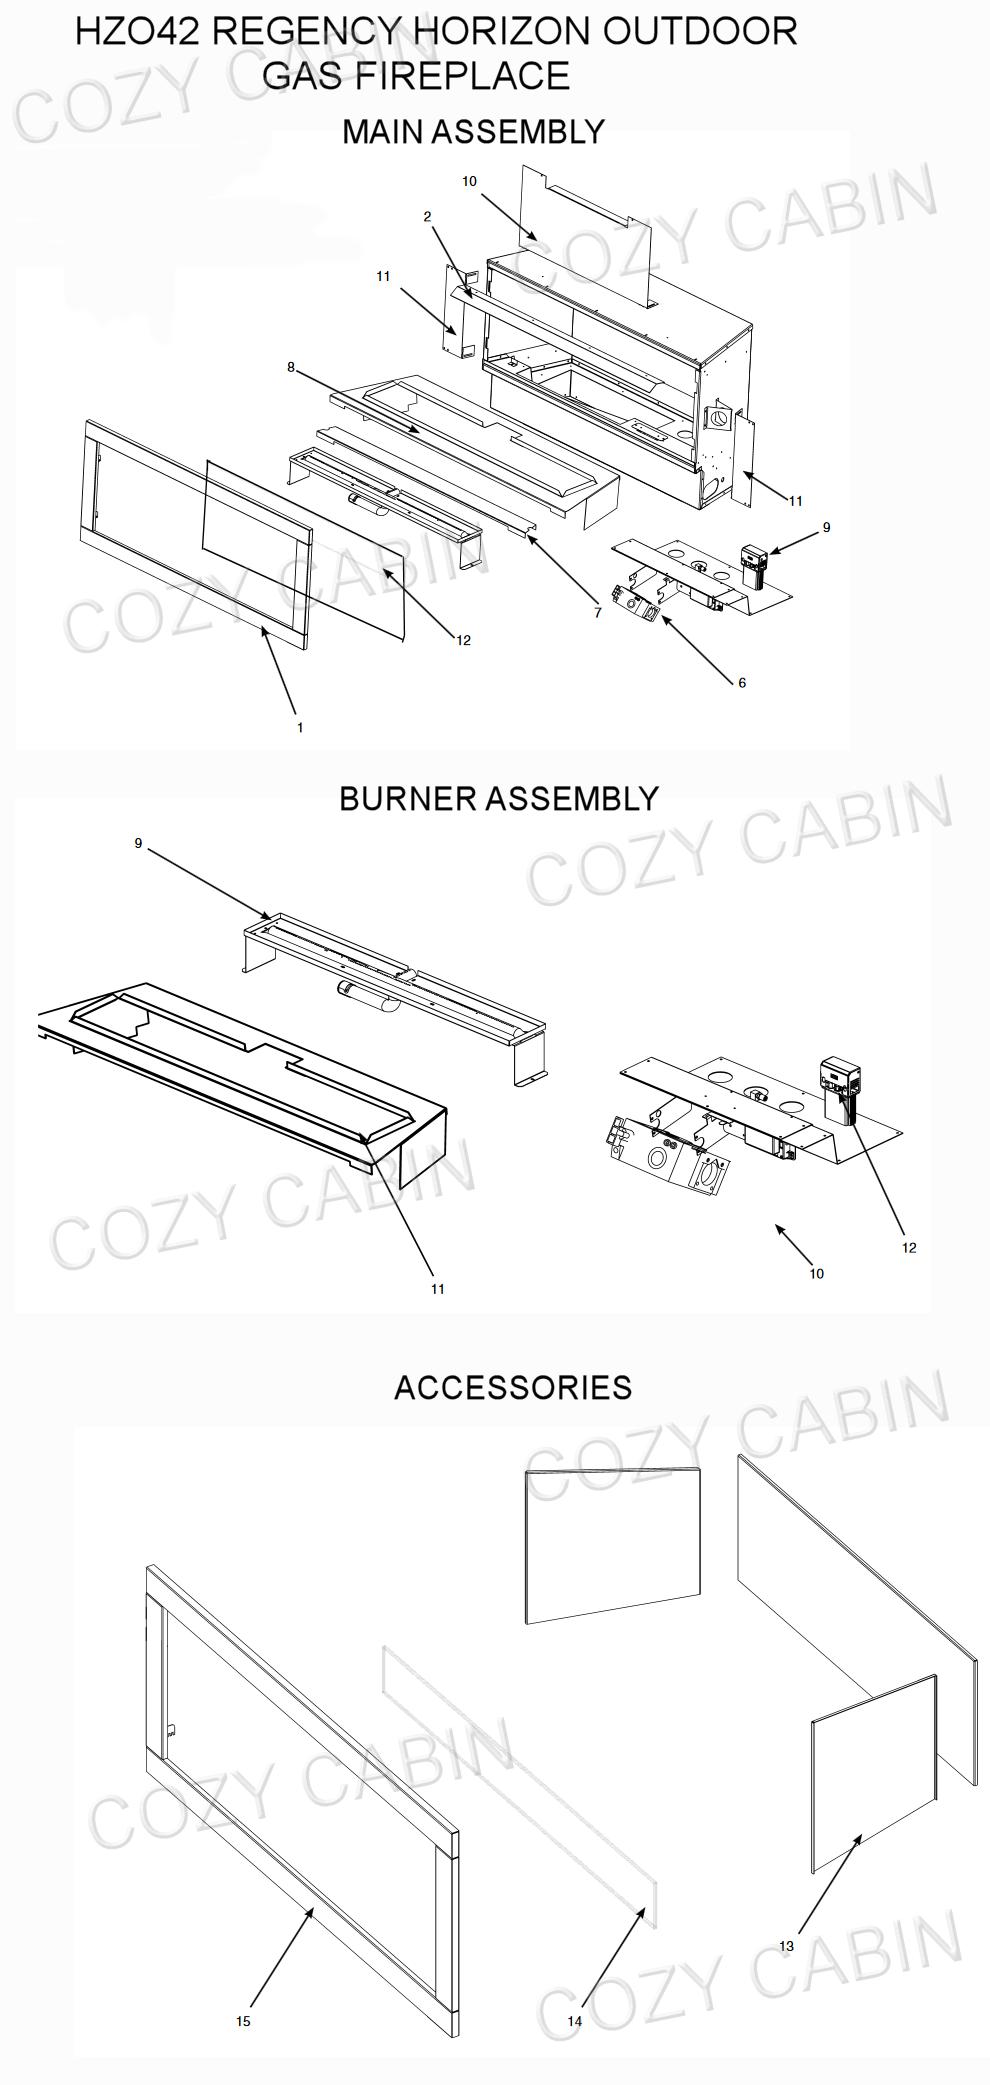 Horizon Outdoor Gas Fireplace Hzo42 Hzo42 Cozy Cabin Regency